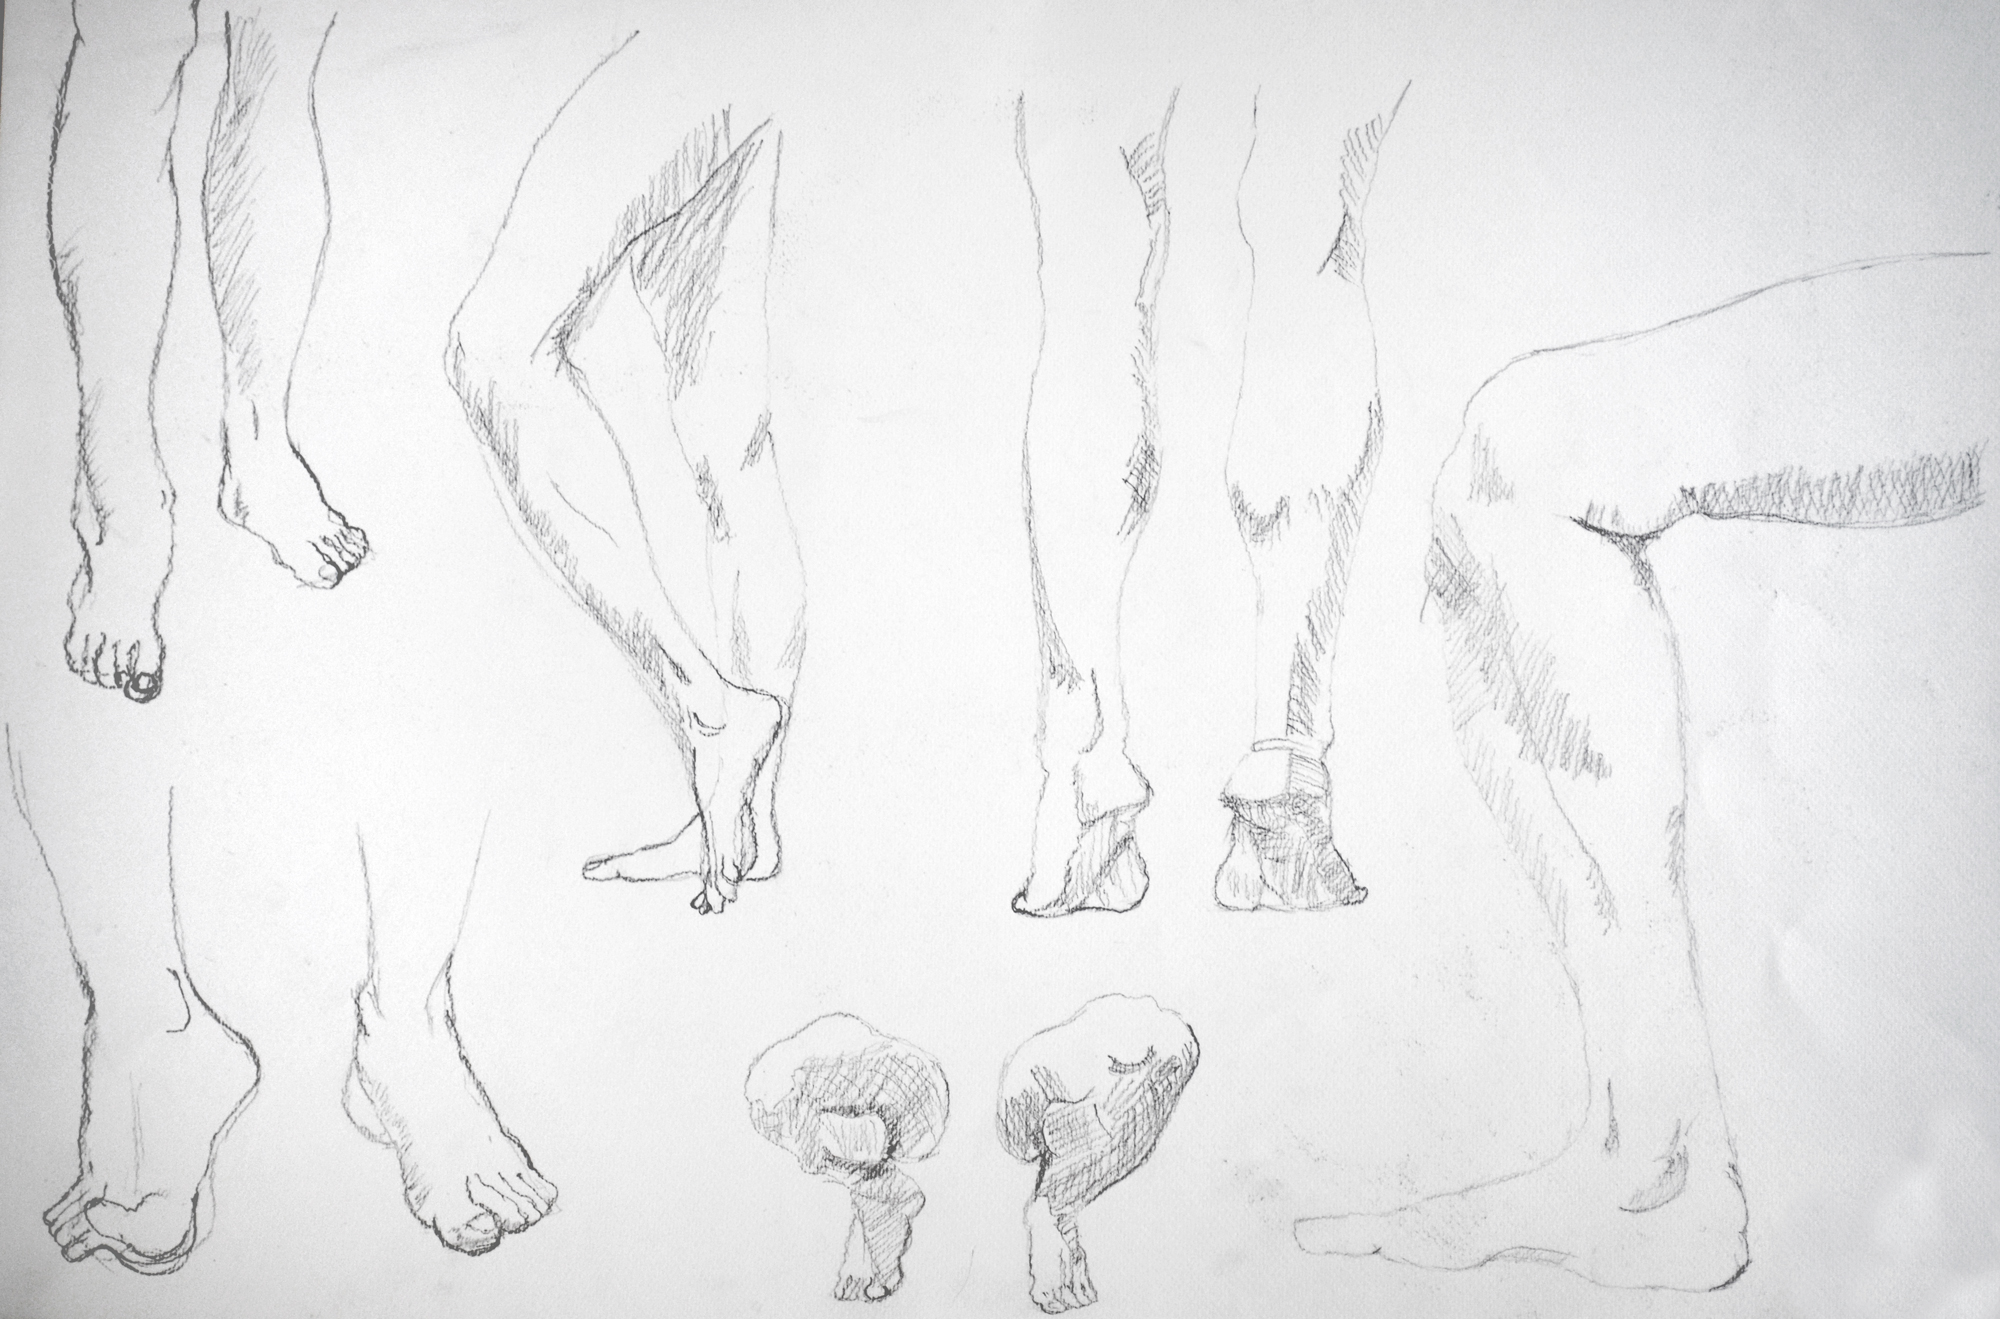 Legs by saadchisty